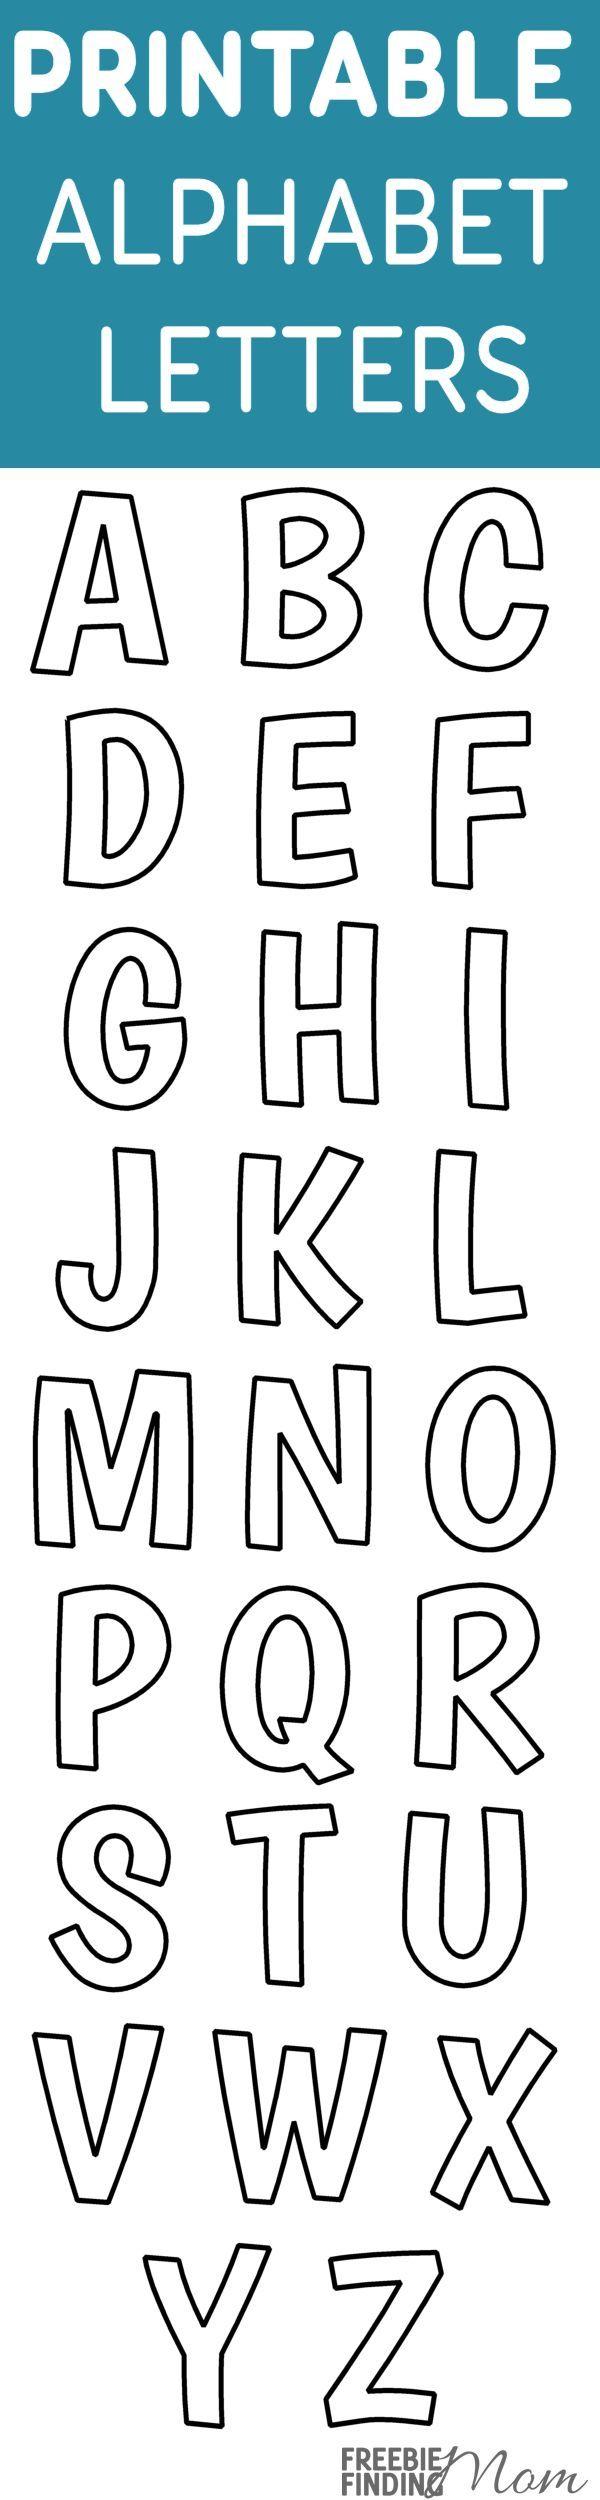 Printable Free Alphabet Templates   Diy Ideas   Pinterest   Alphabet - Free Printable Alphabet Templates